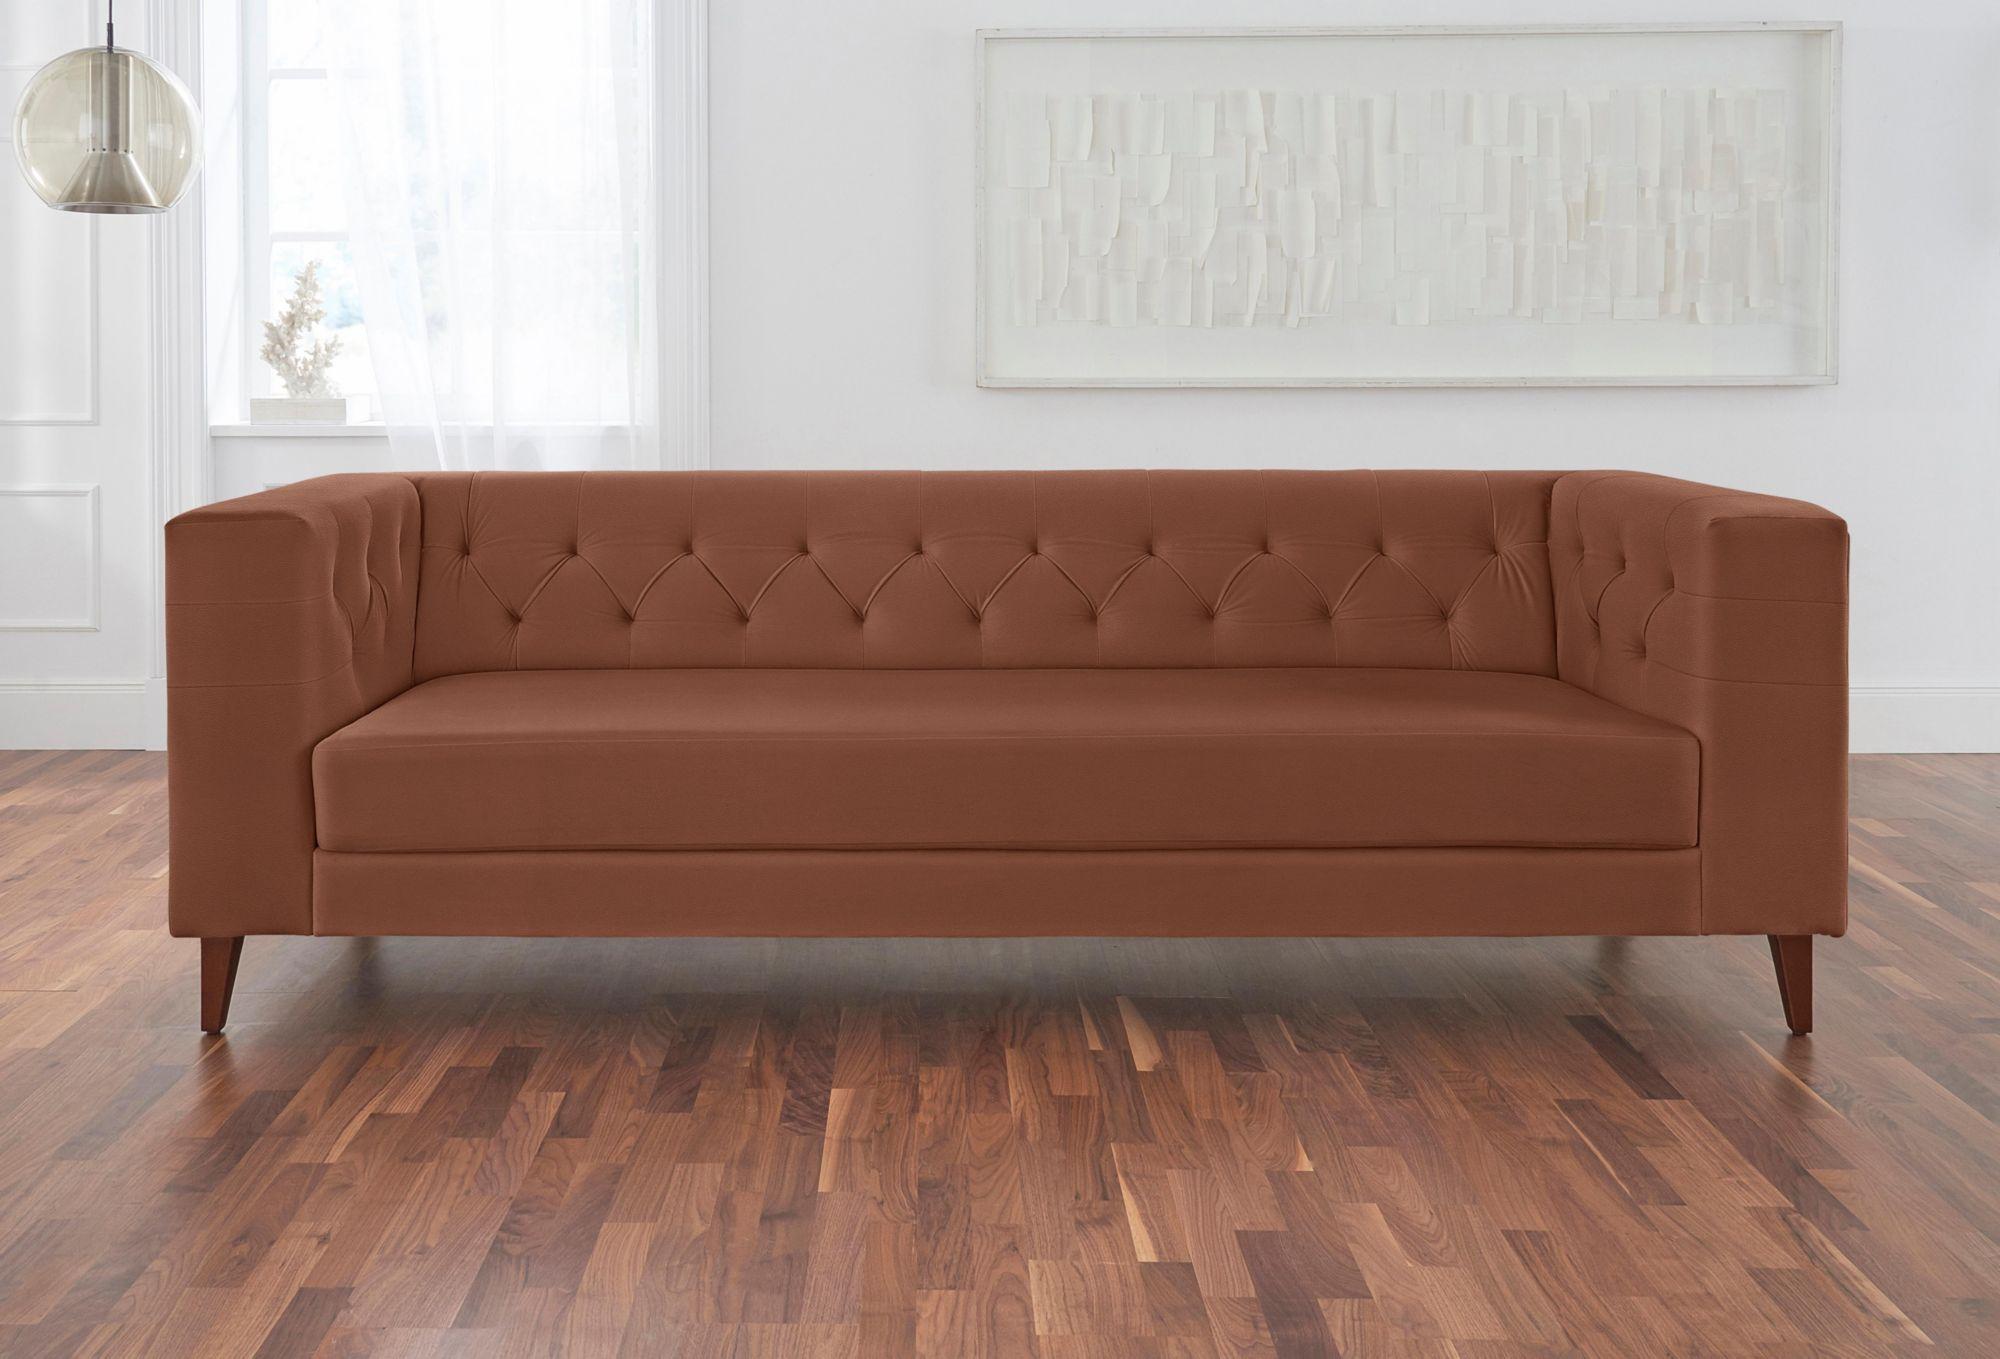 ALTE GERBEREI Alte Gerberei 3-Sitzer Sofa »Evelin« mit Knopfheftung